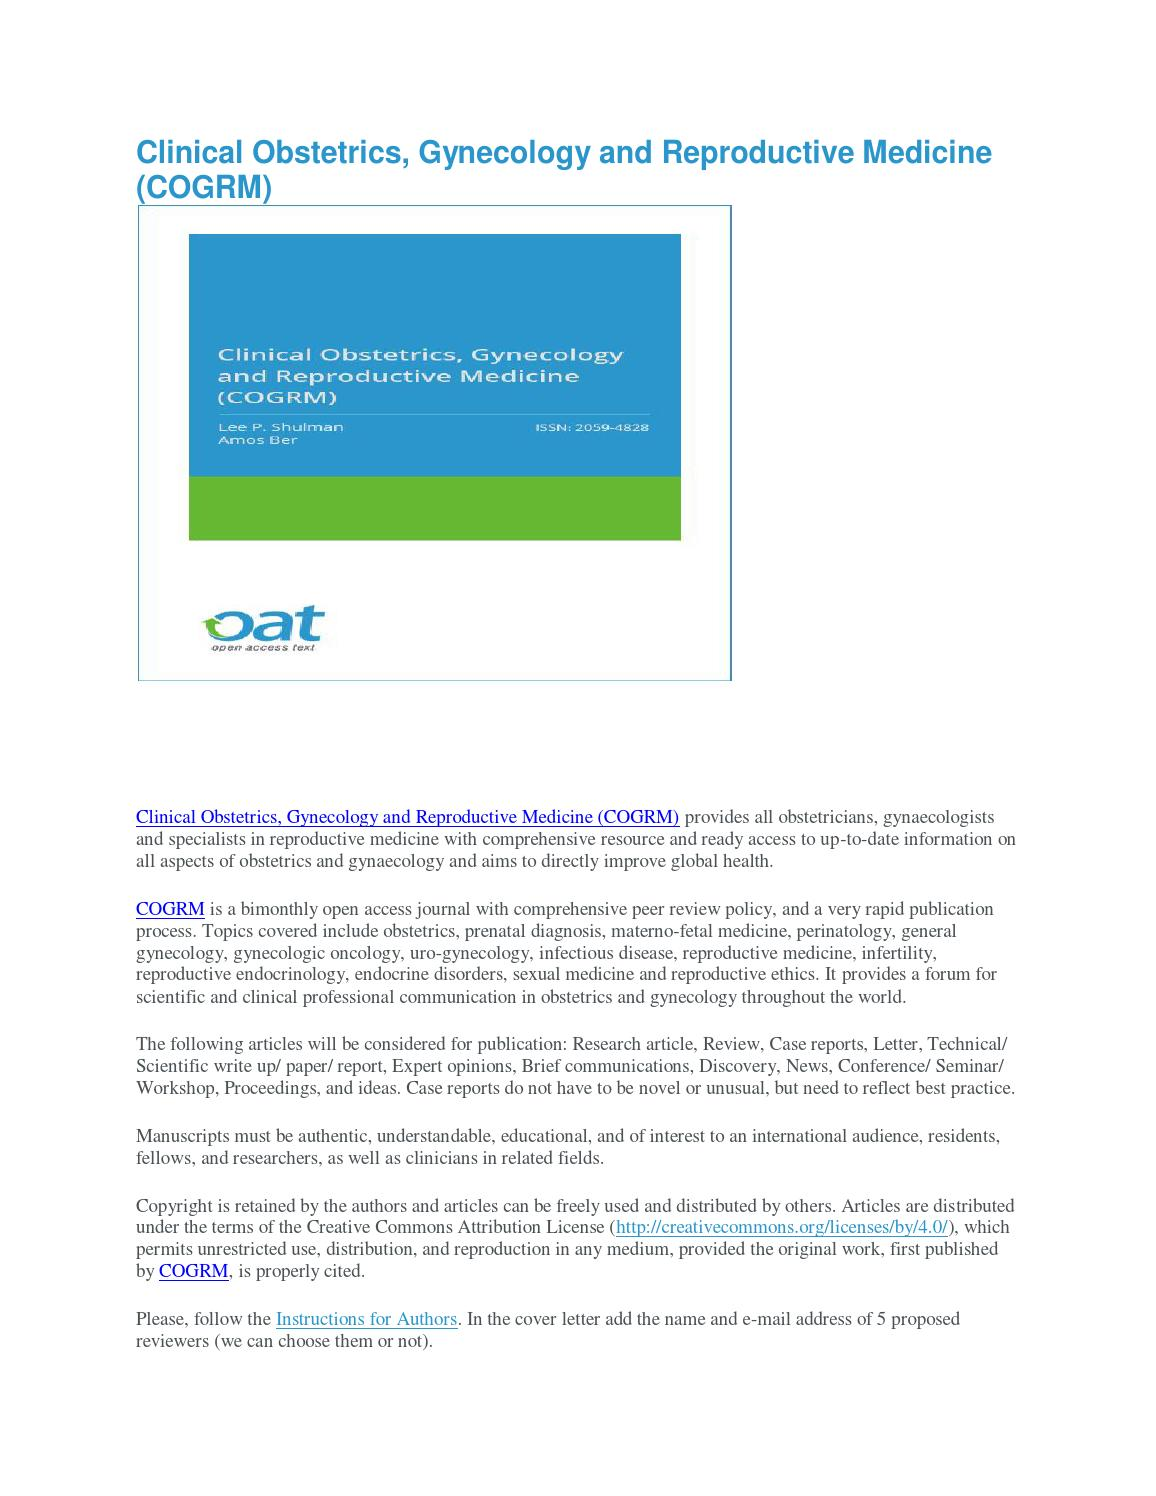 Clinical obstetrics